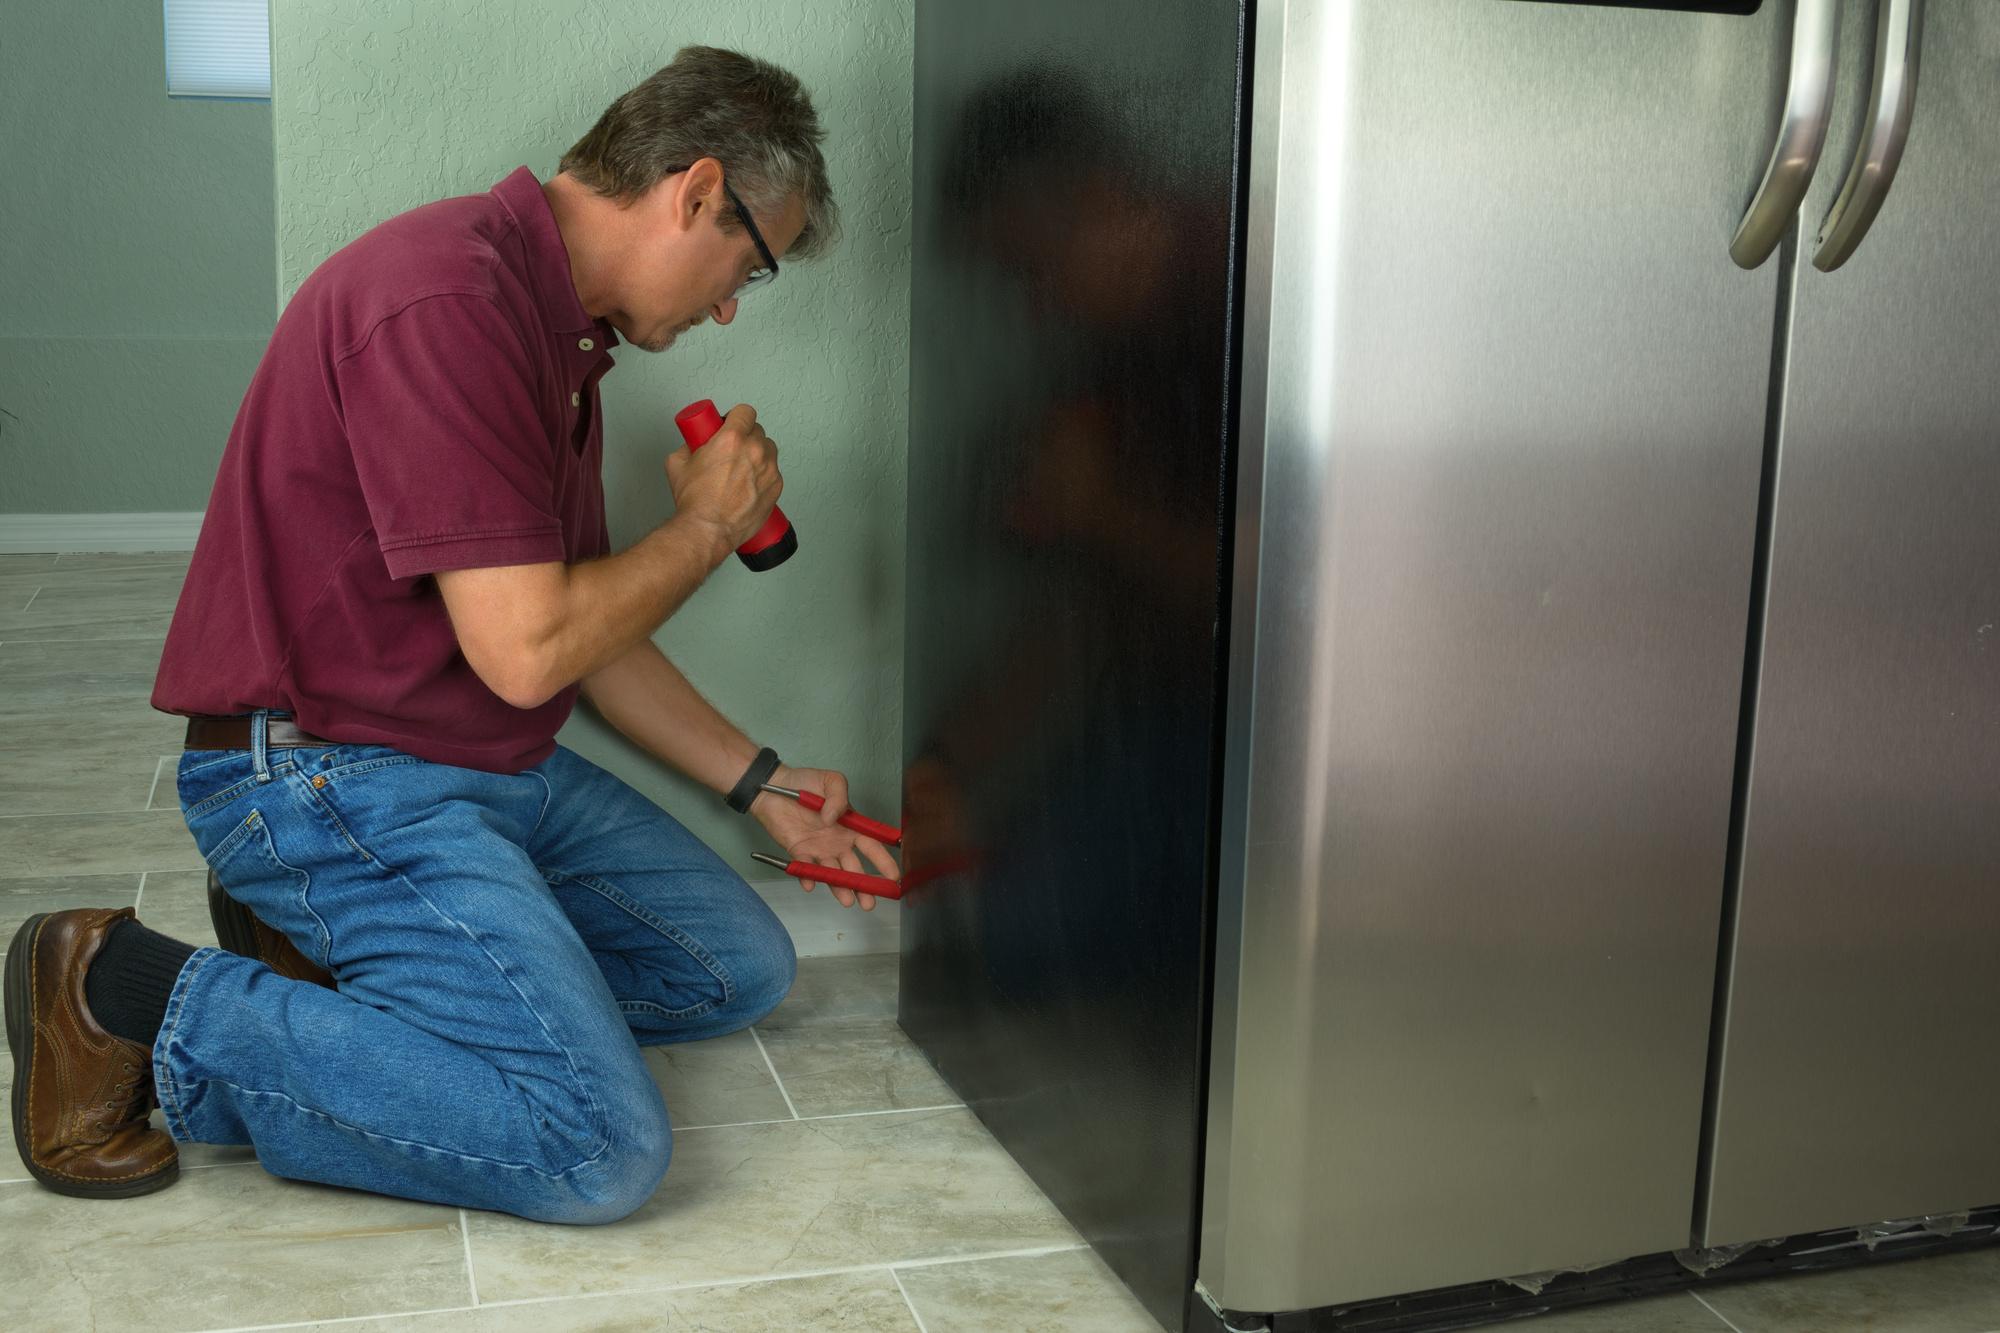 repair or replace a refrigerator